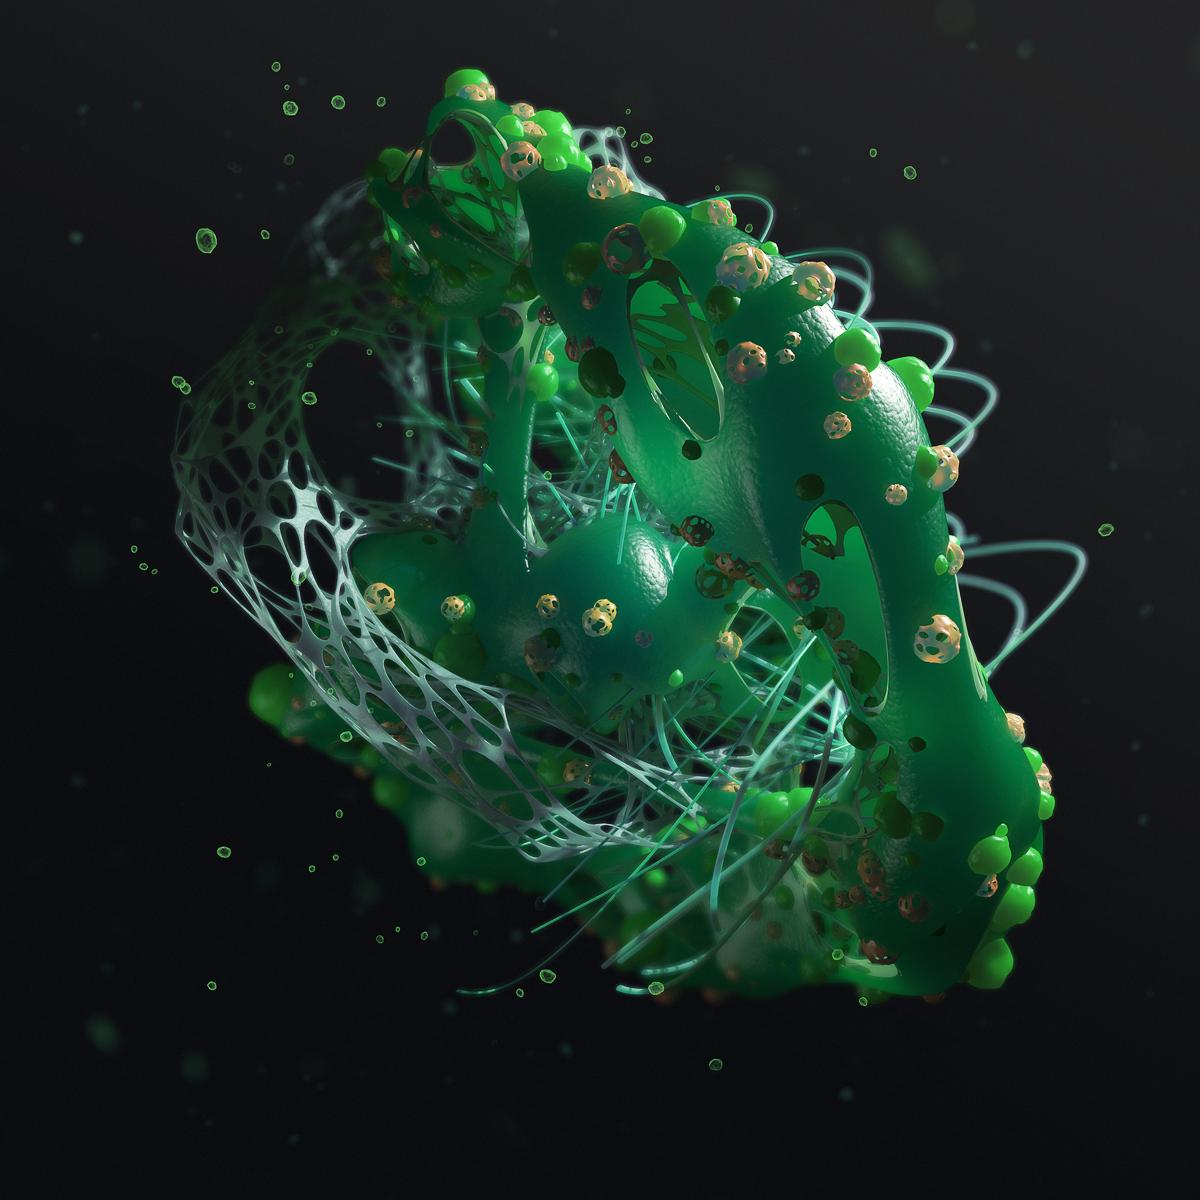 Eukaryo - Bioshap3d 3D project